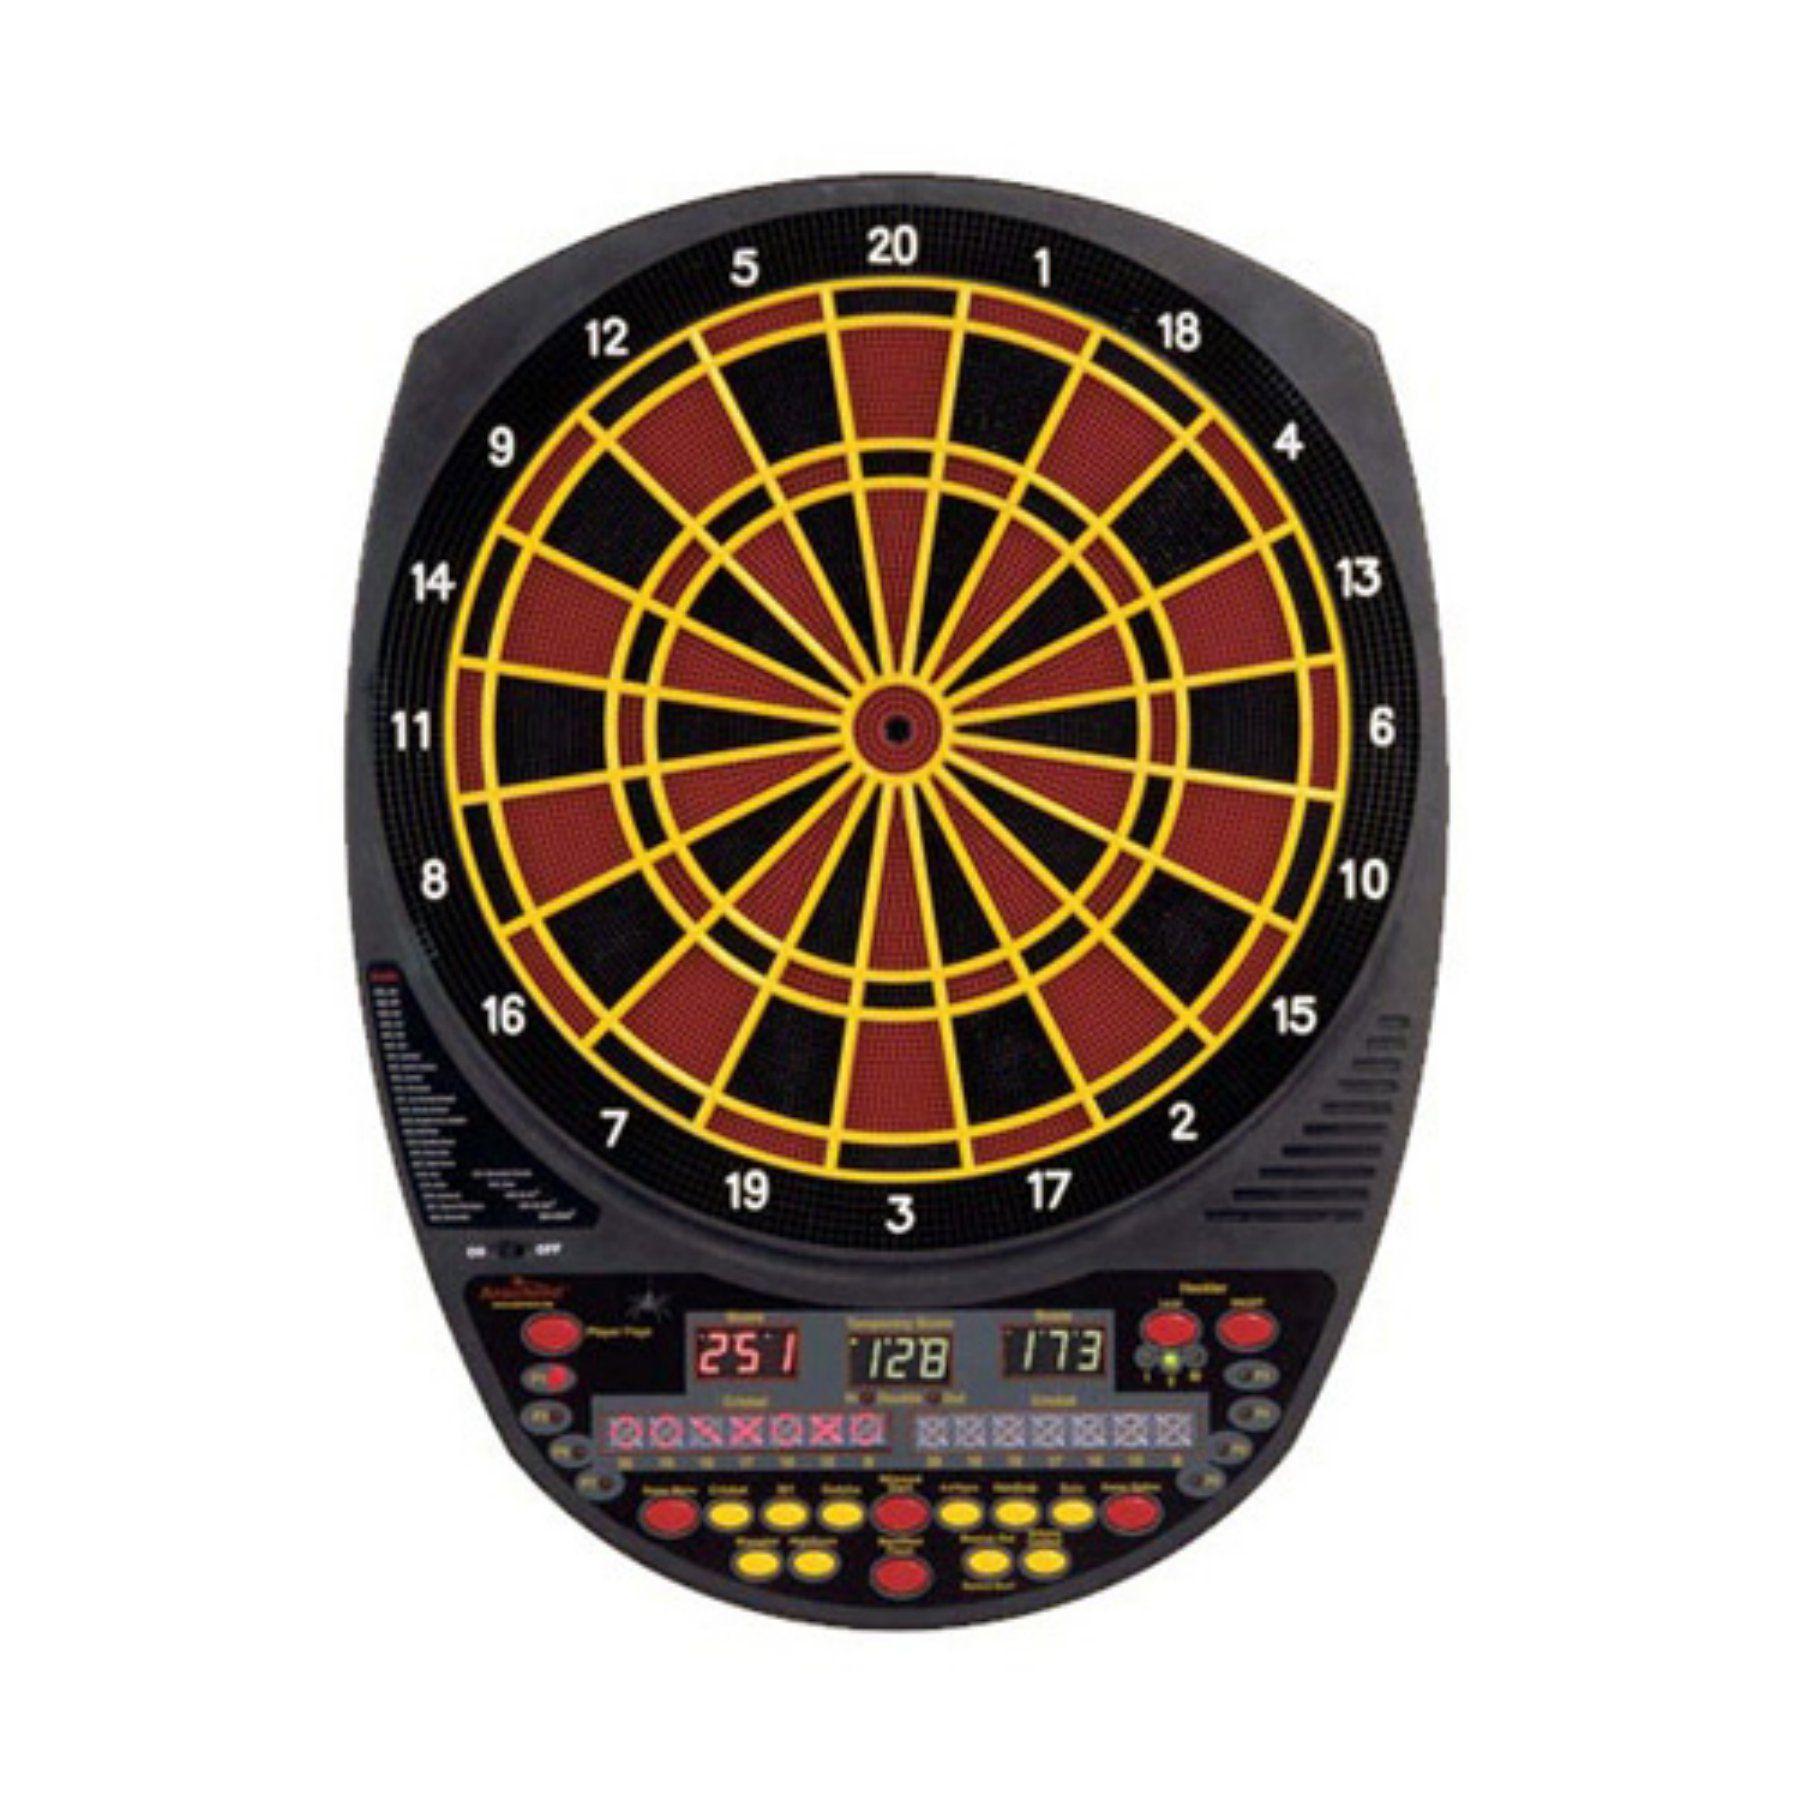 Arachnid® InterActive 3000 Electronic Dart Board and